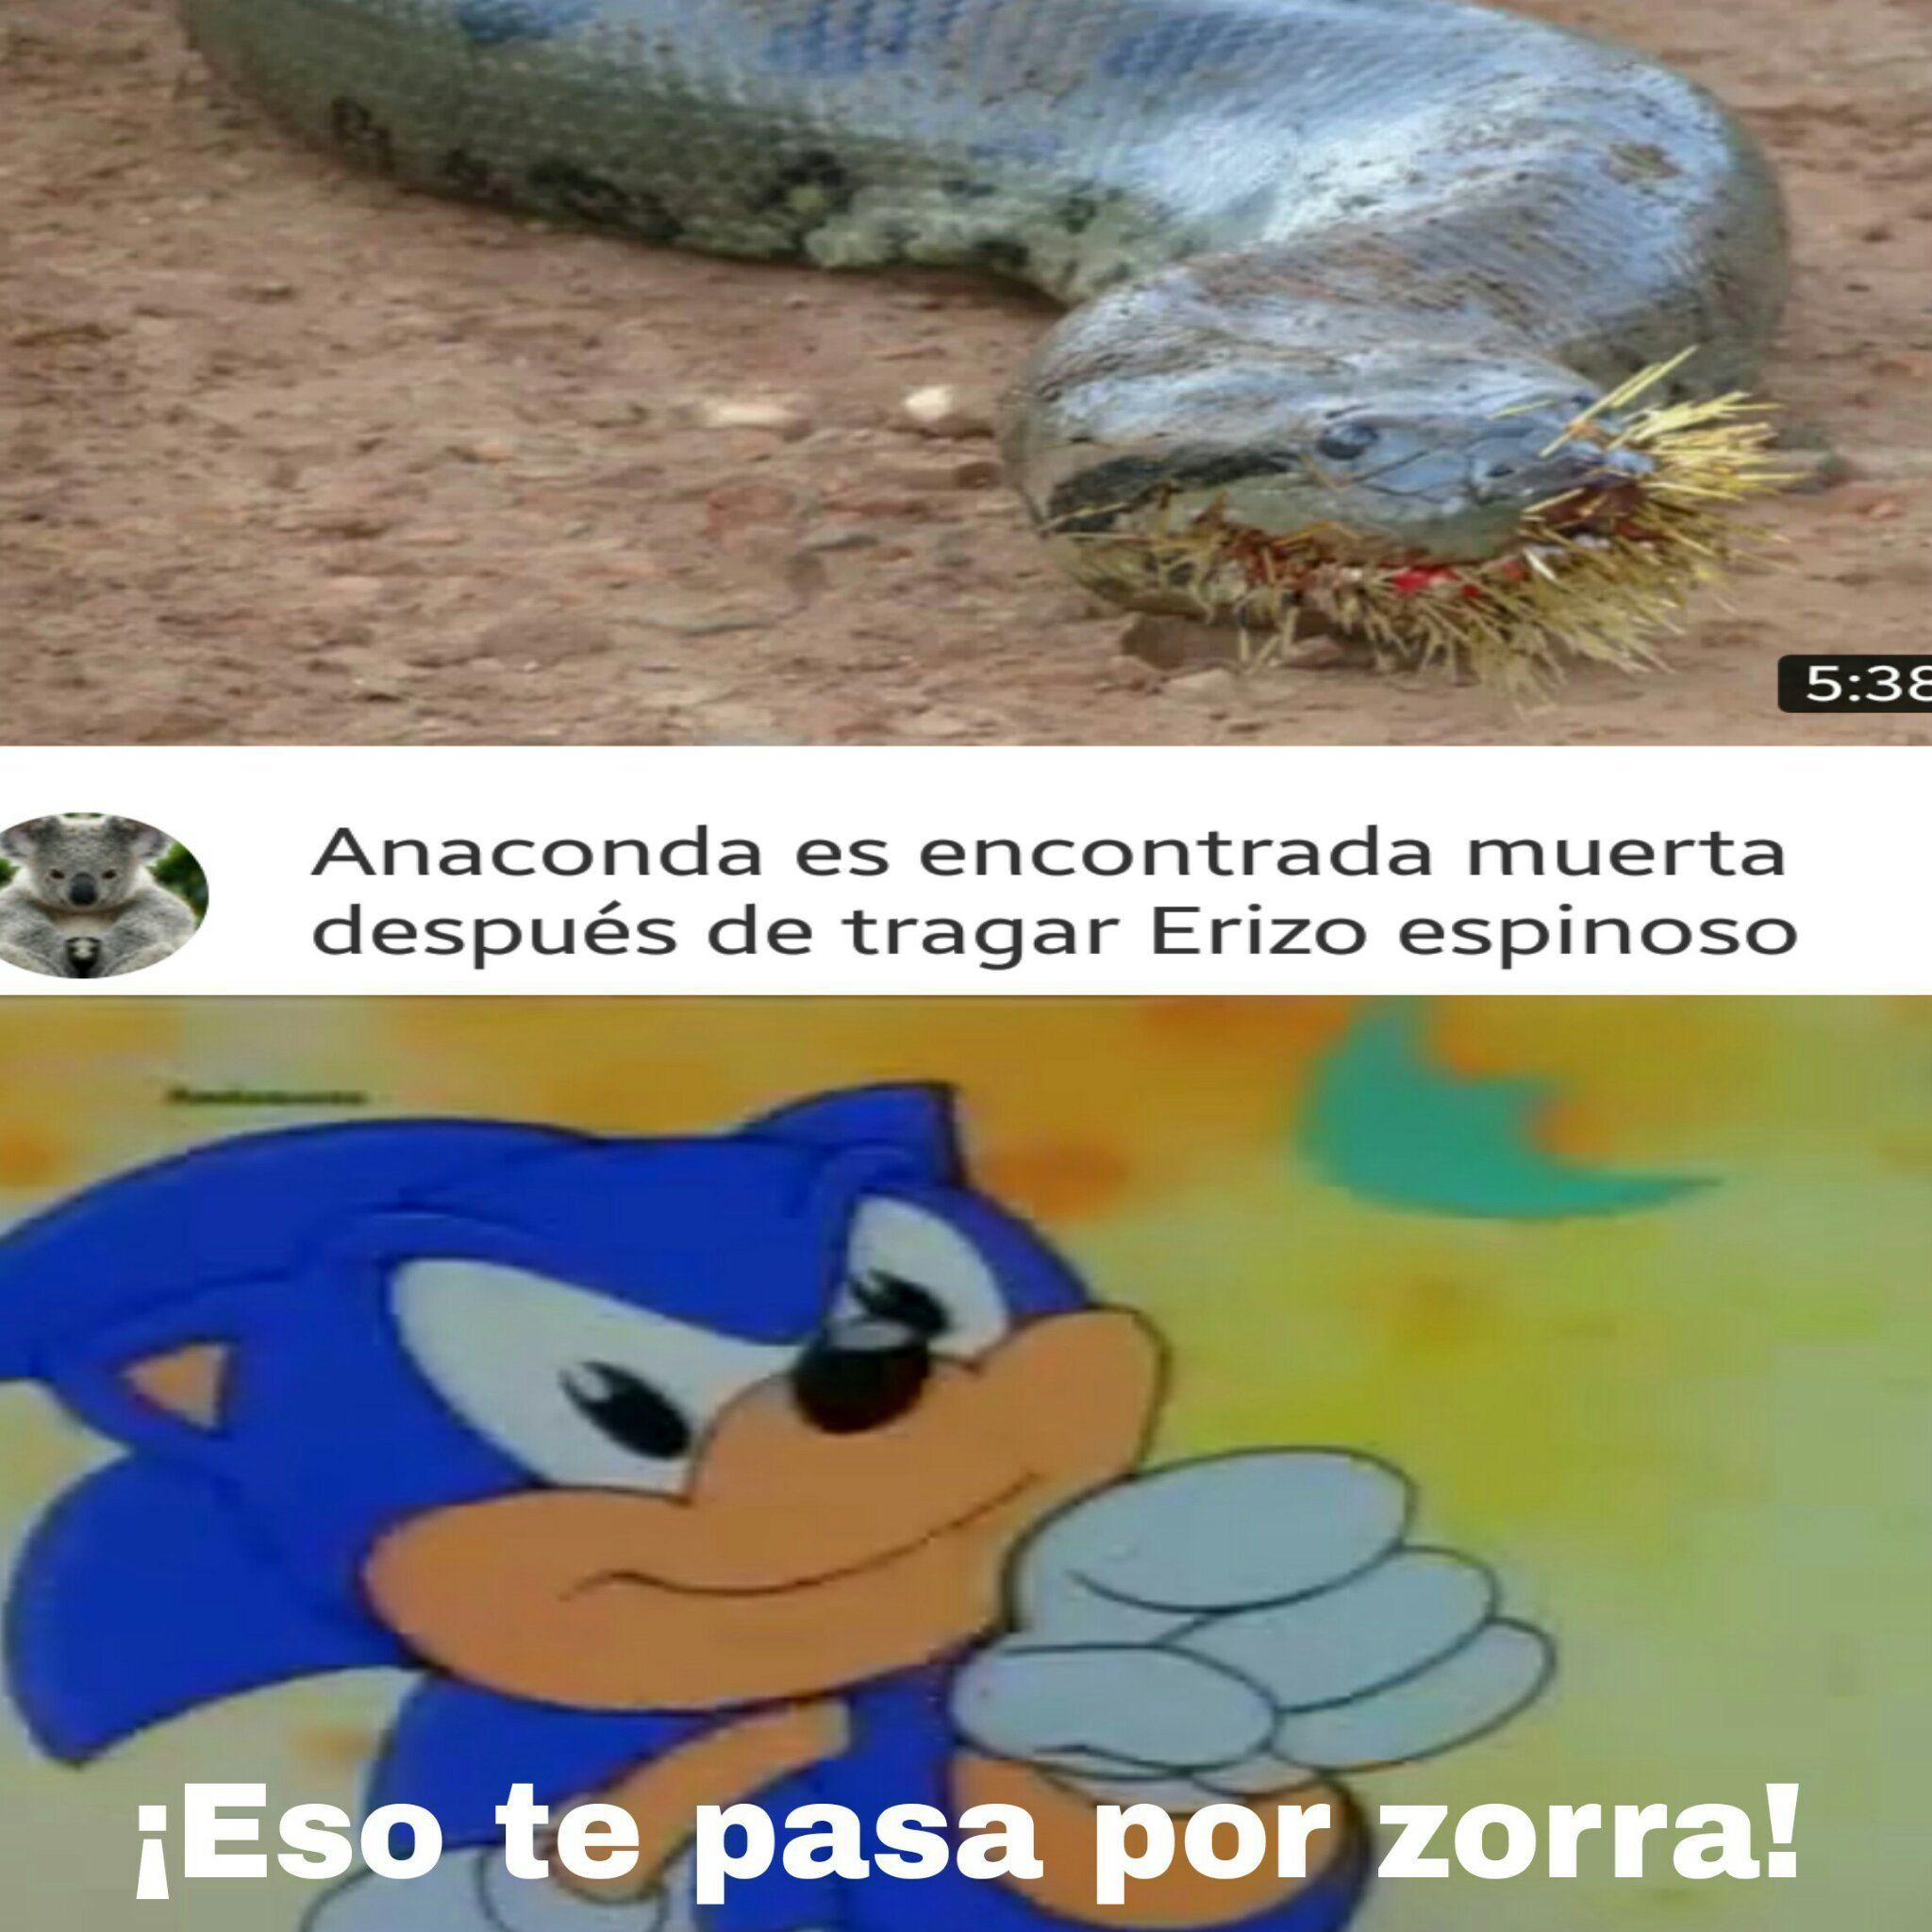 Plantilla combinada - meme | memes | Pinterest | Memes, El meme and Meme